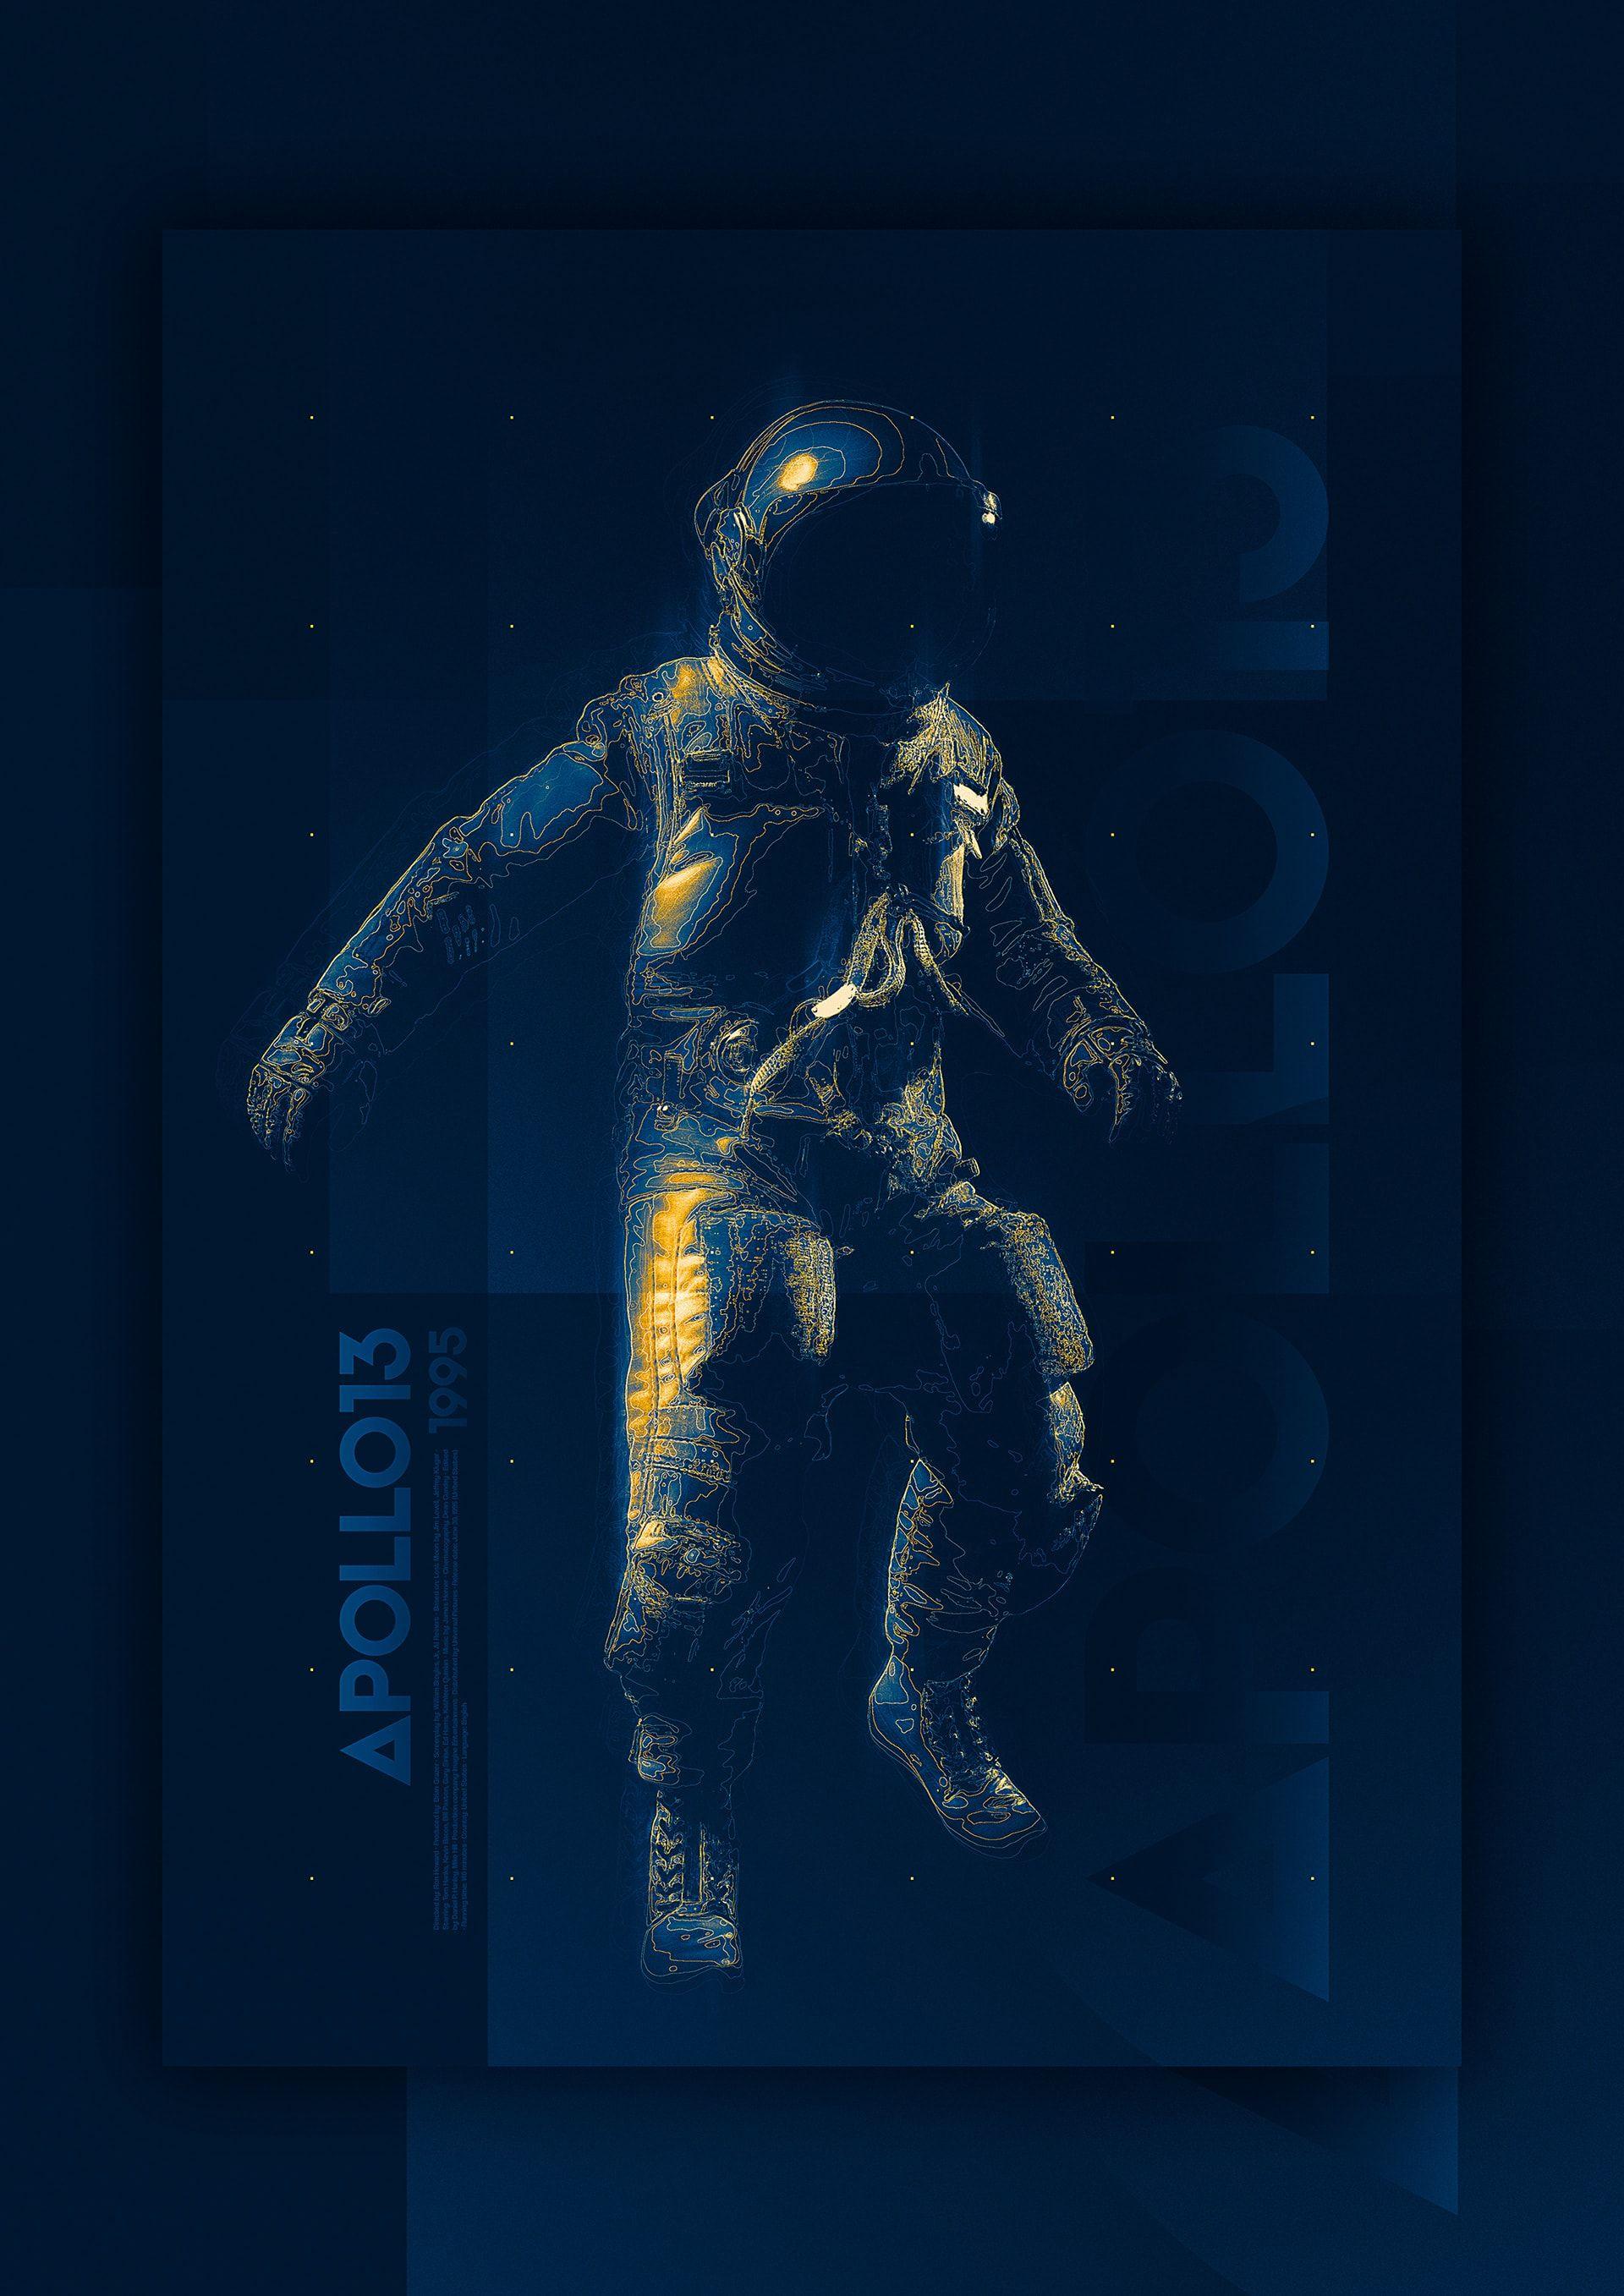 20 Stunning Flyers Posters Design Ideas Creative Poster Design Creative Posters Abstract Poster